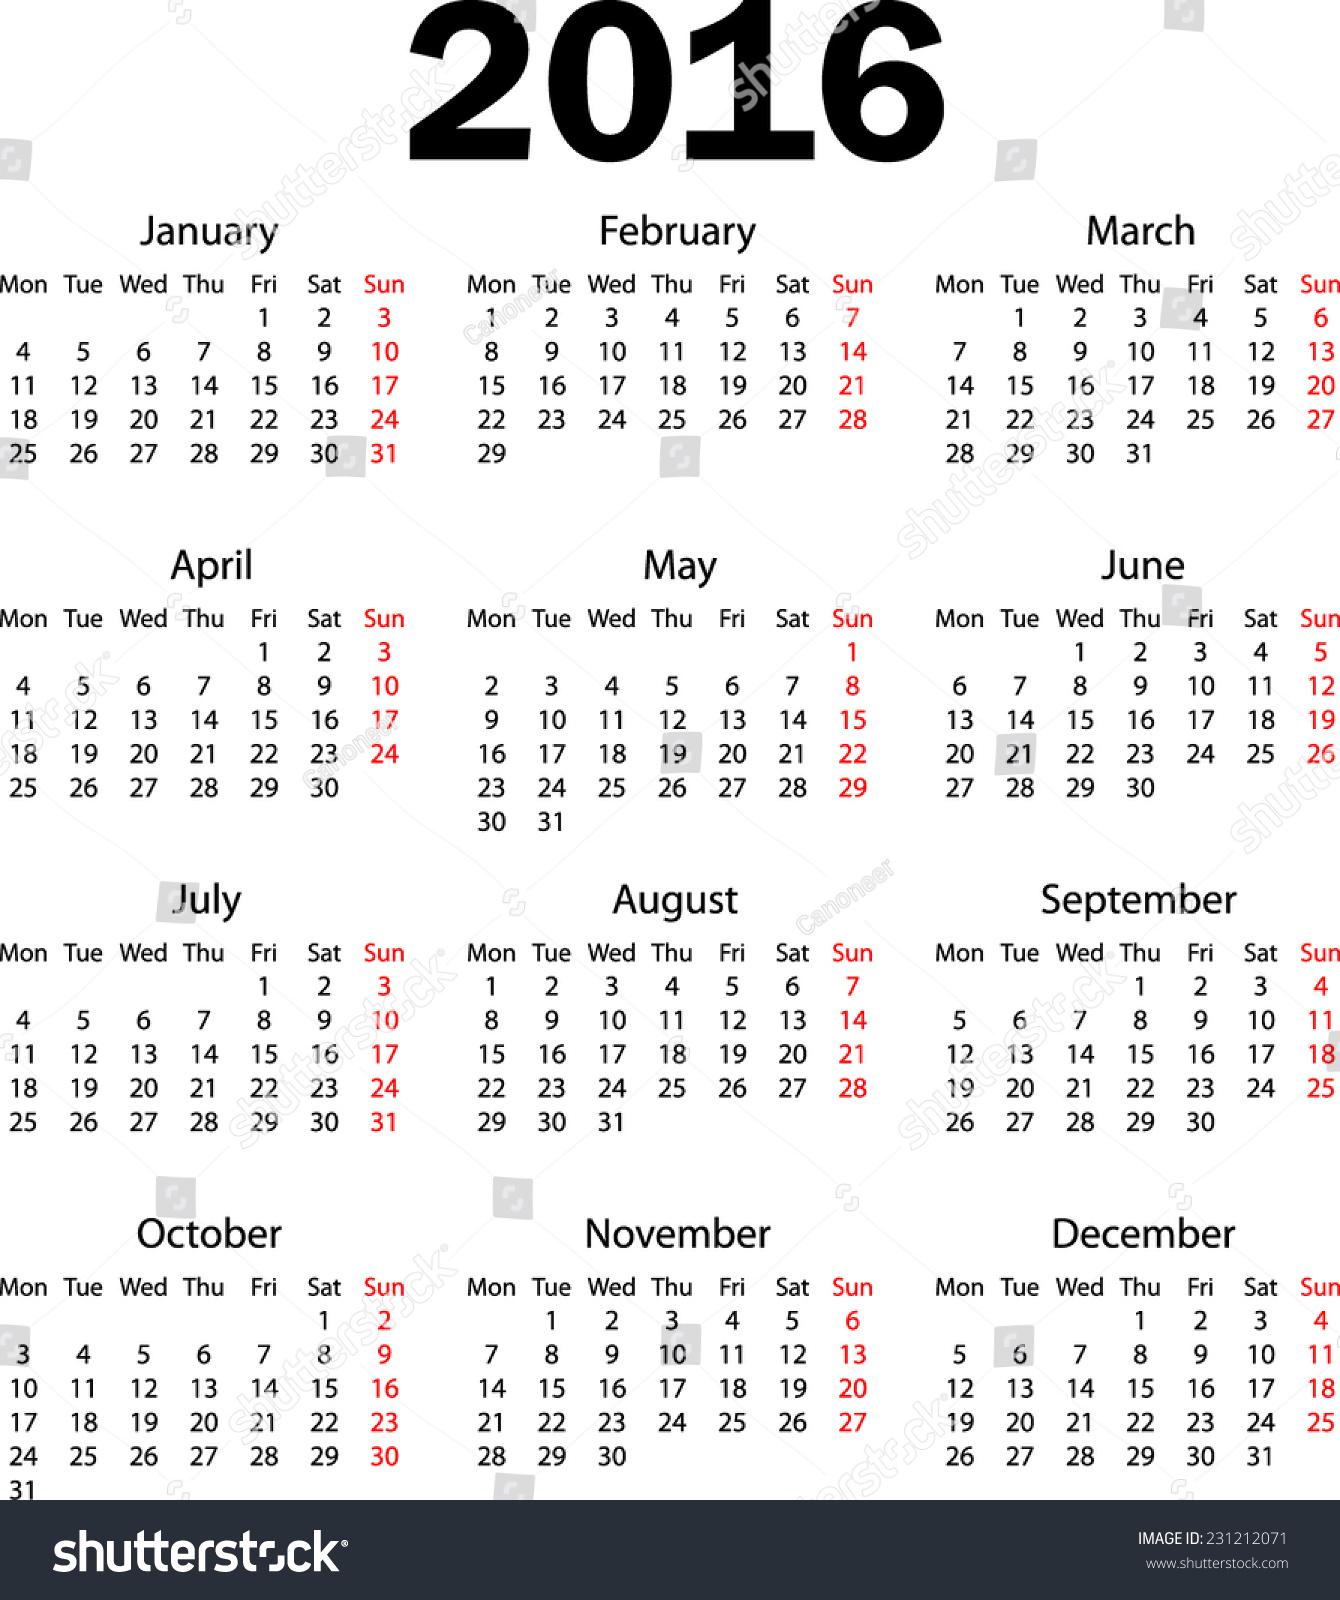 Calendar Monday Start : Calendar starting monday stock vector